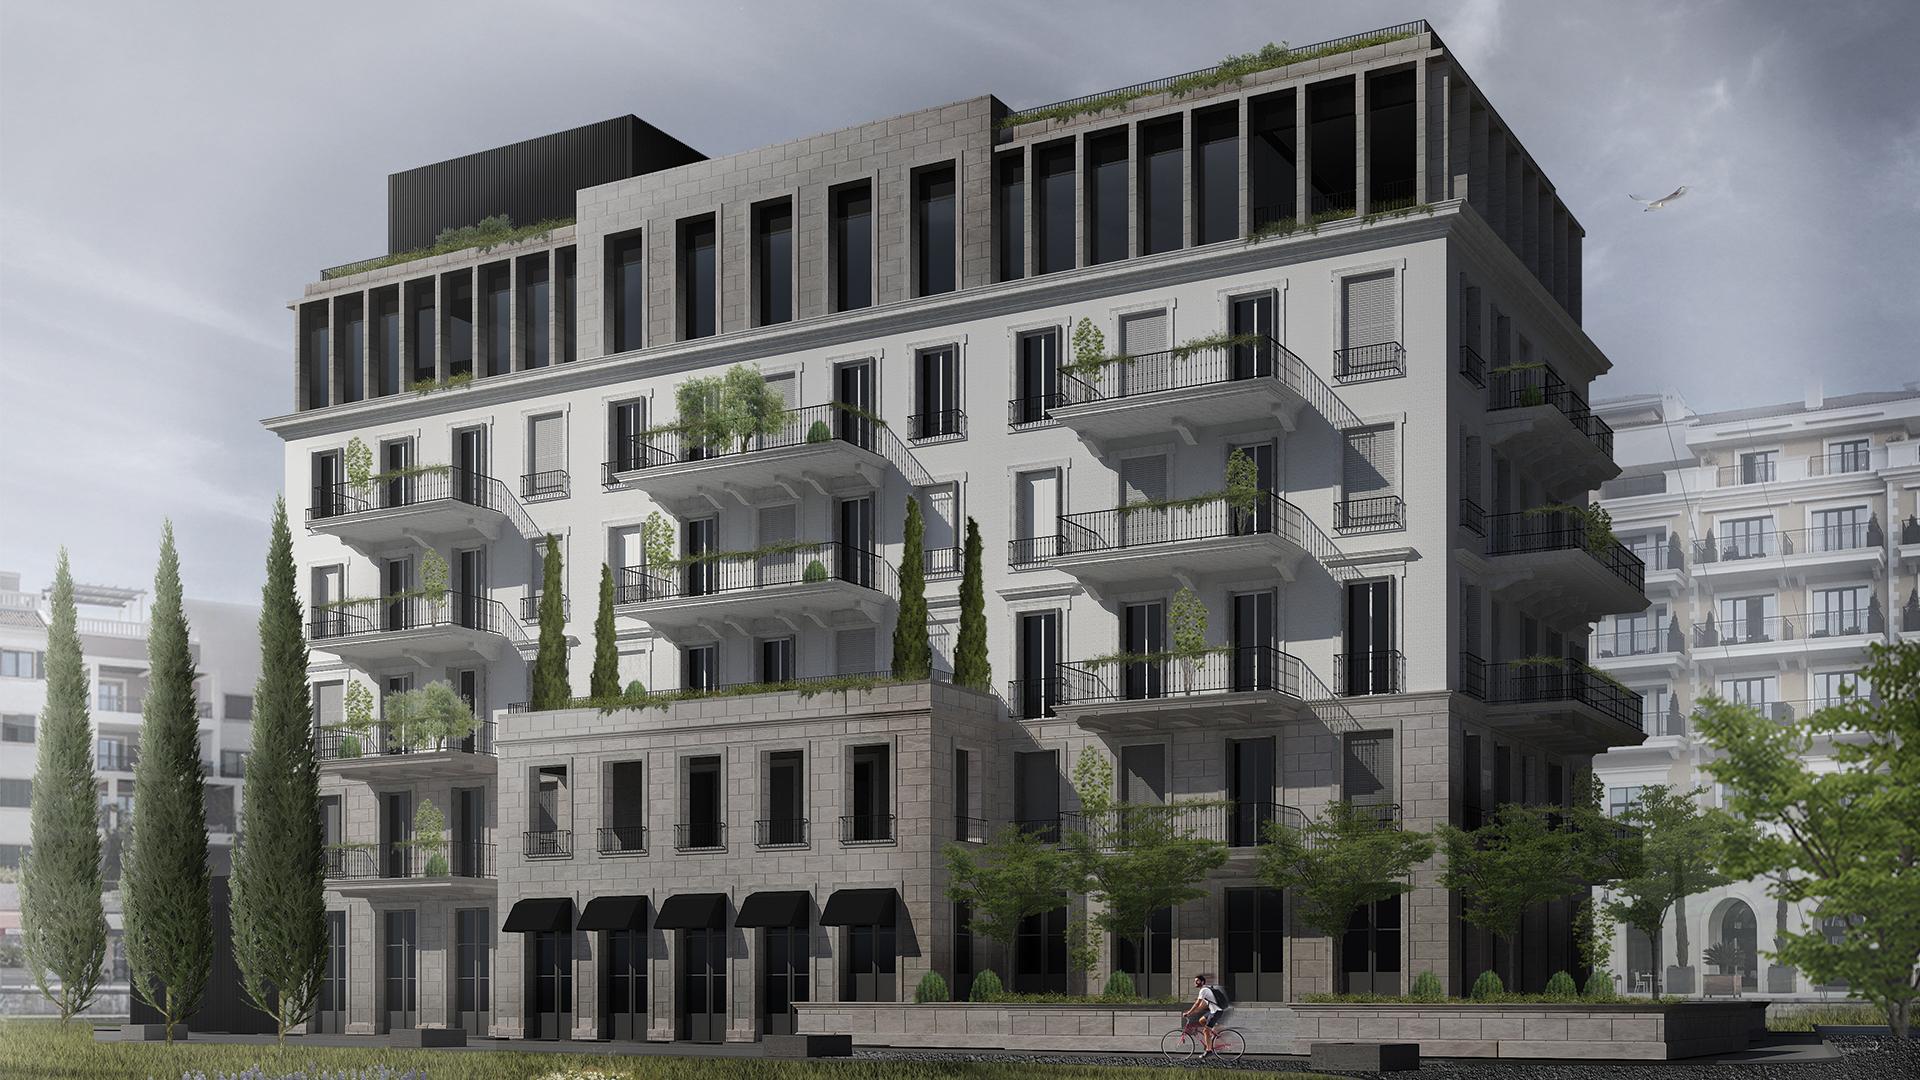 https://generalinvest.me/upl/2020/08/Porto_Palace_3.jpg